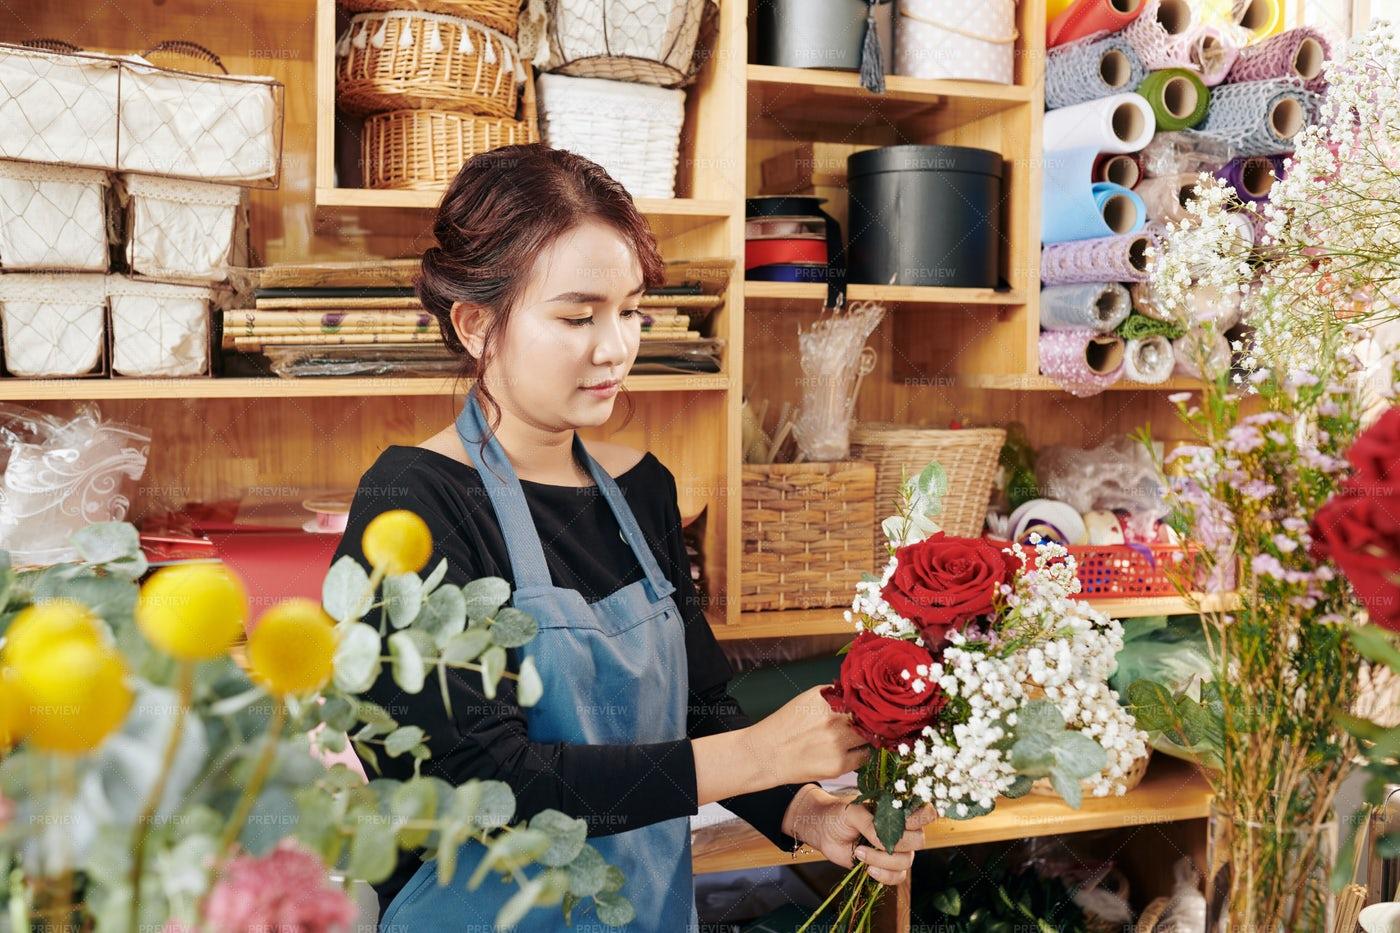 Florist Making Bouquet For Customer: Stock Photos